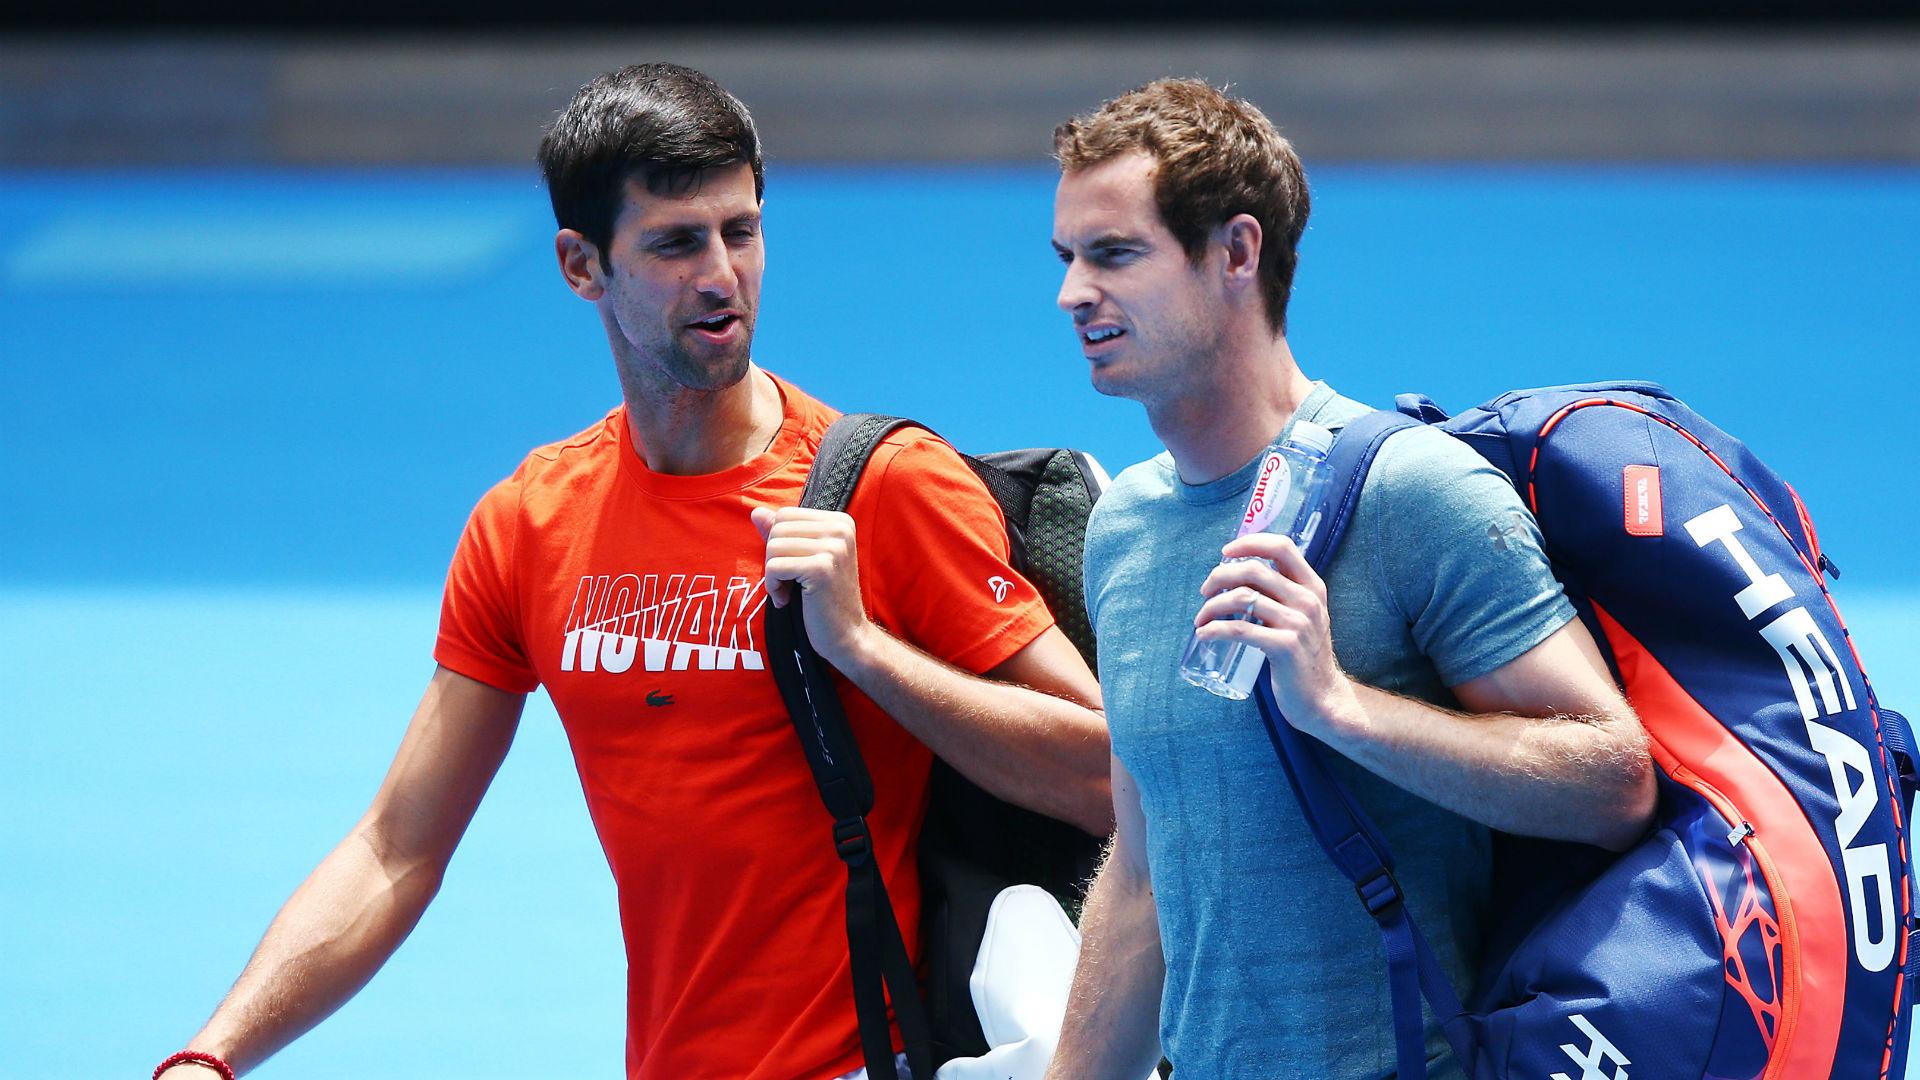 Djokovic: I can relate to Murray's injury woe